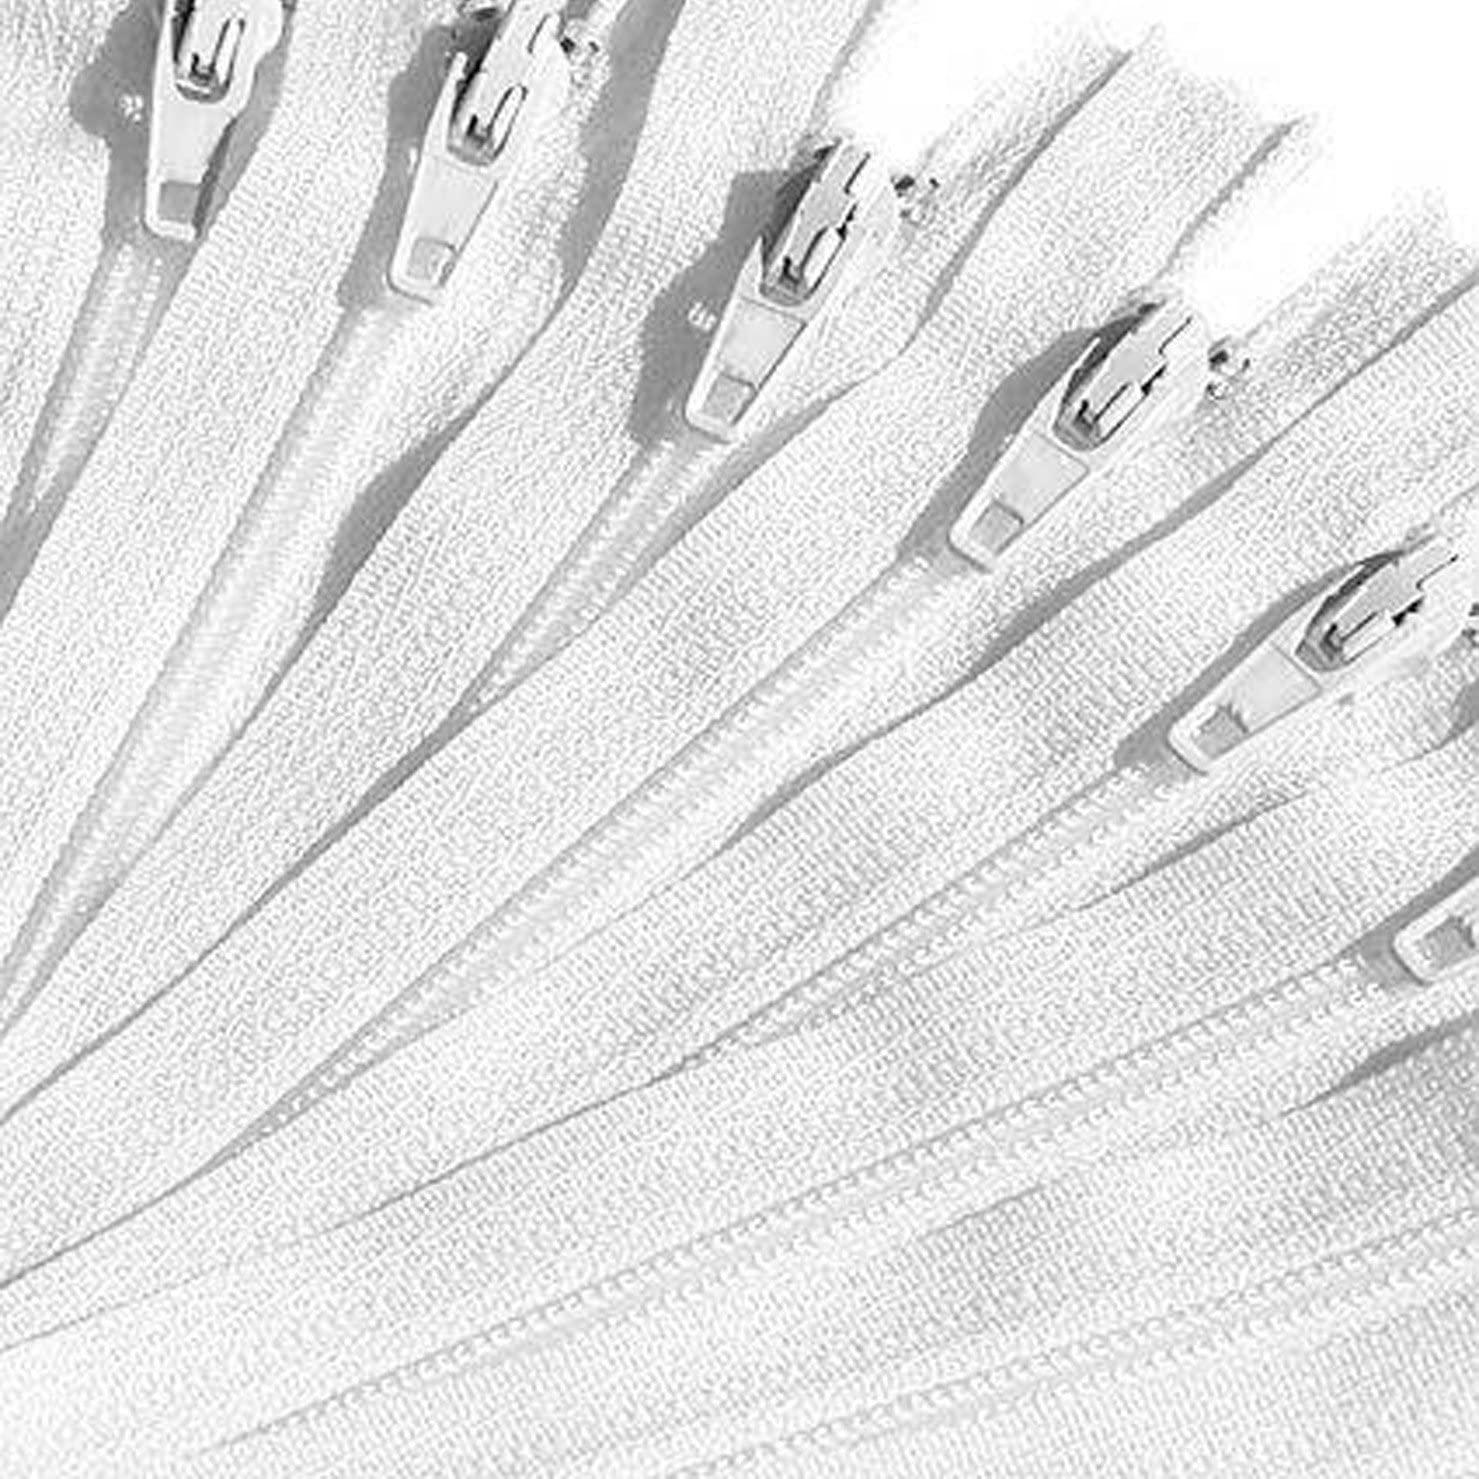 KGS 9 inch Nylon Zipper Zippe | 12 Zippers/Pack (White)